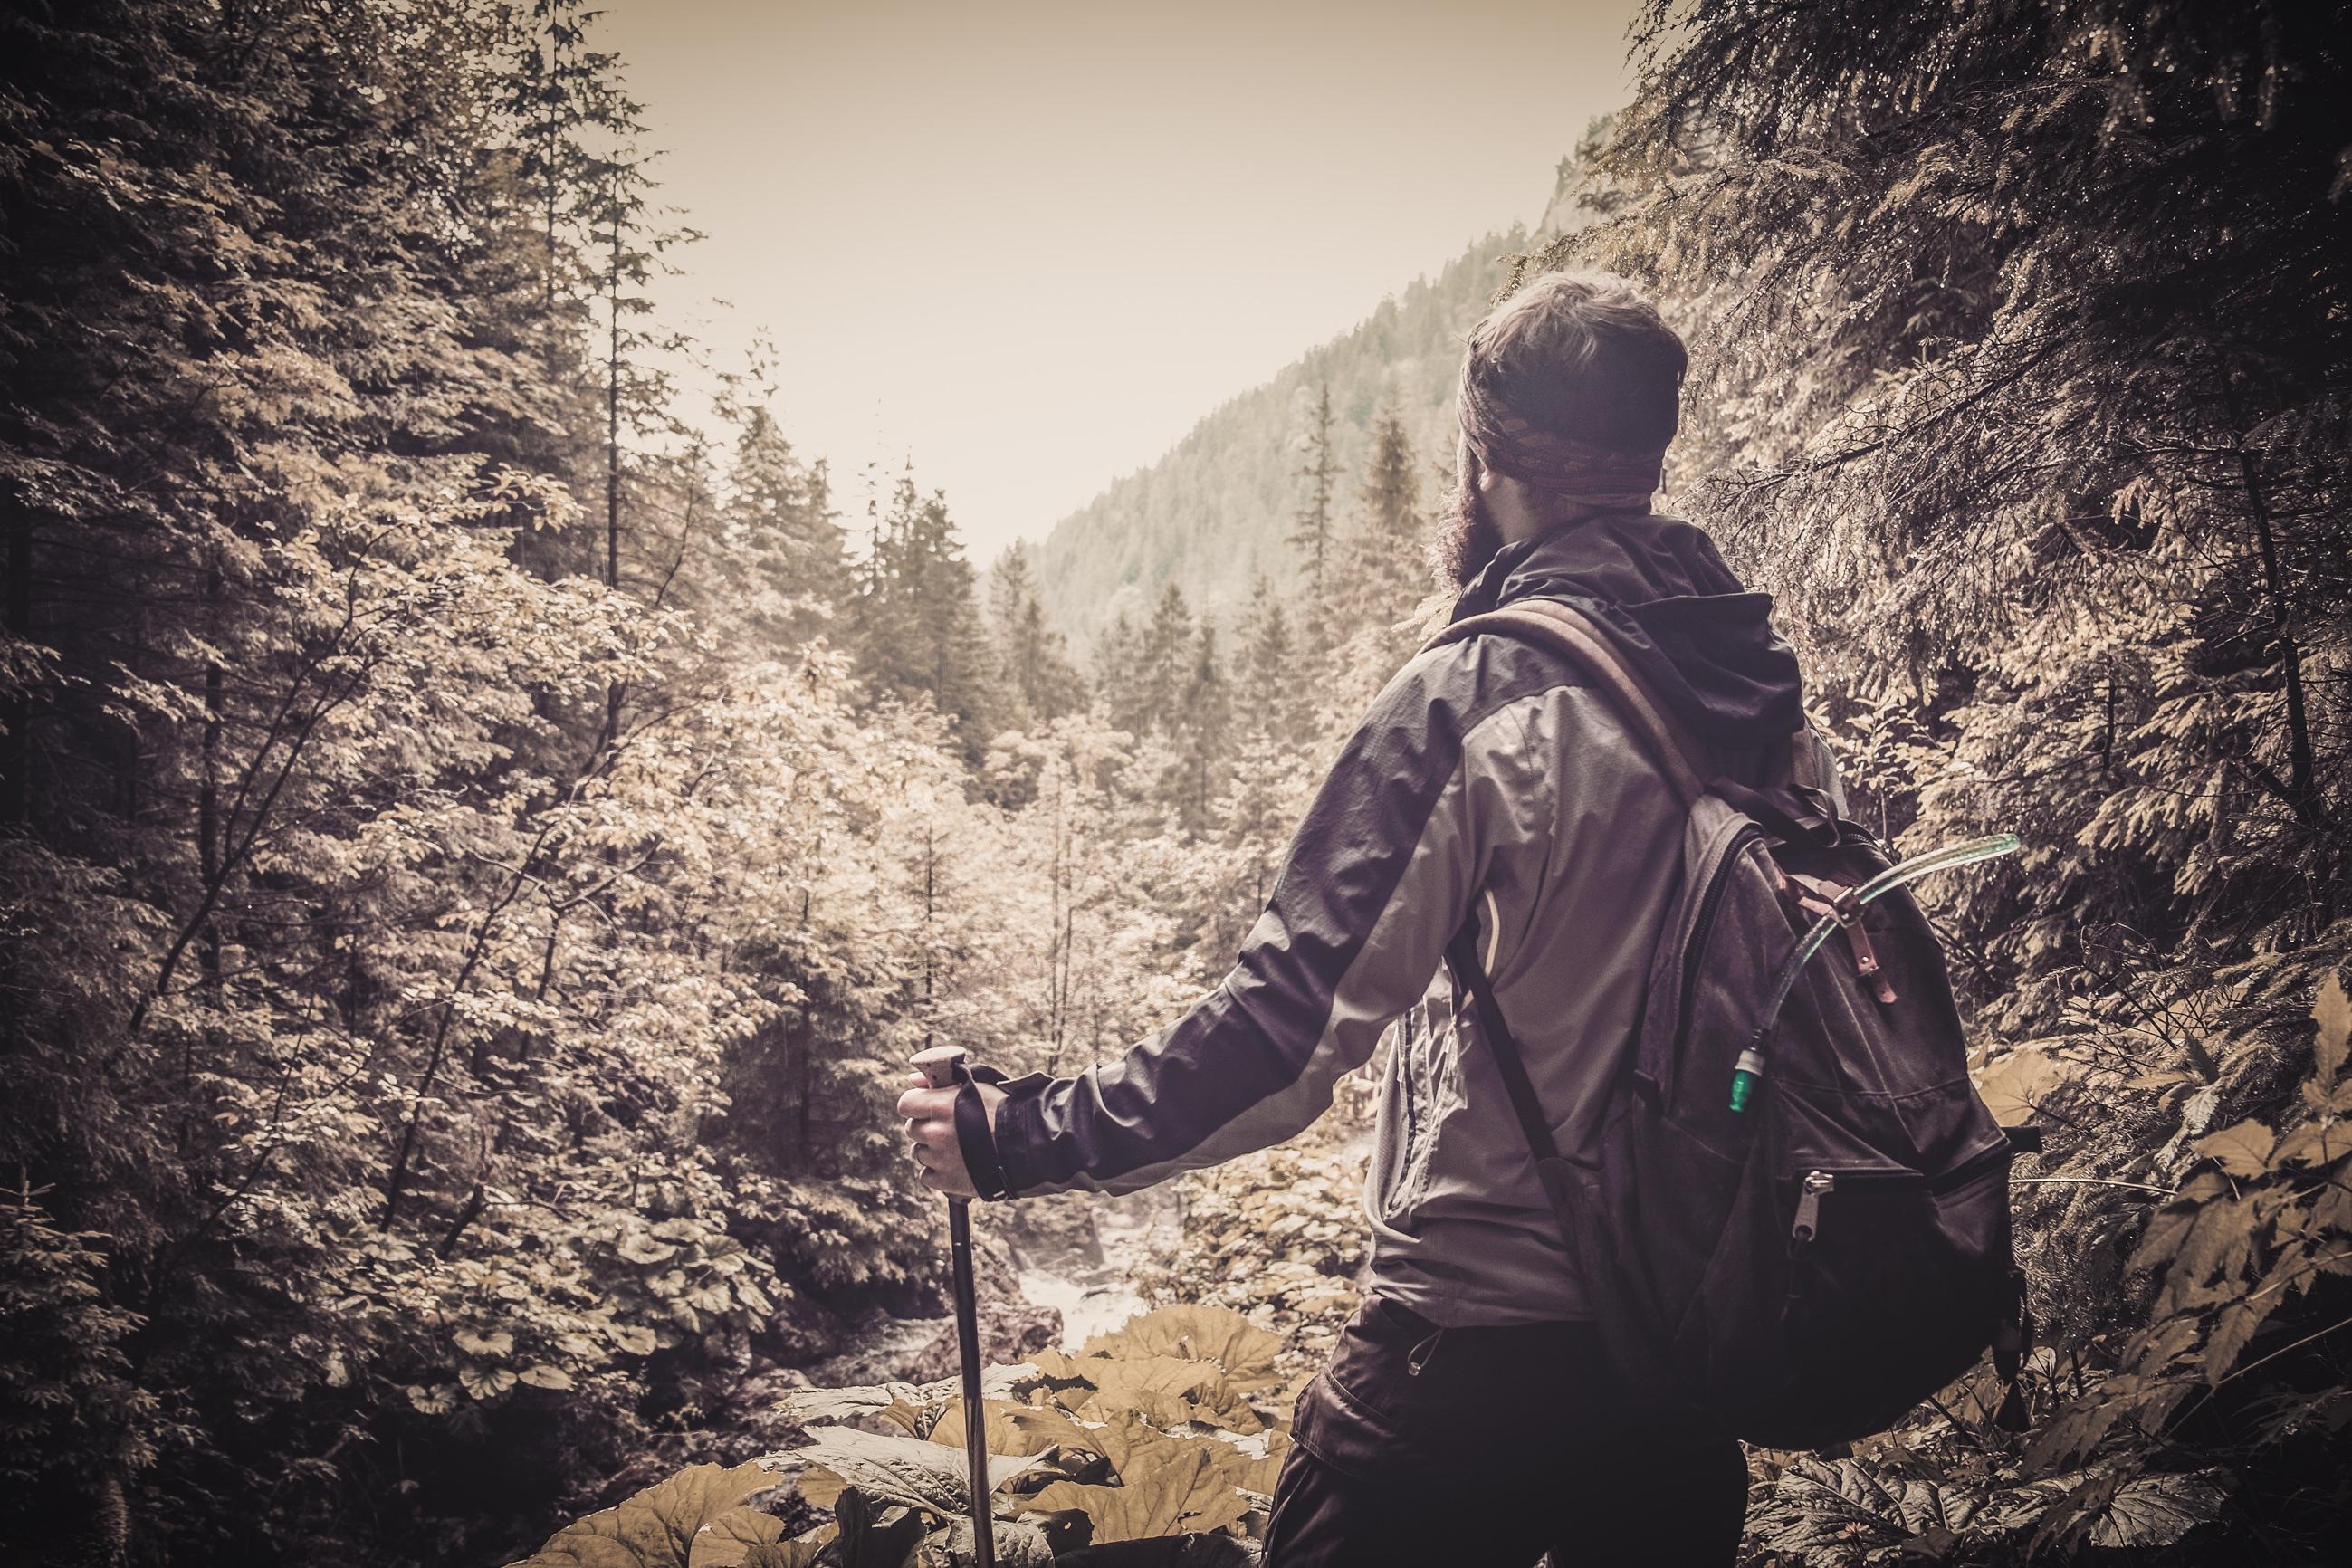 What Types Of Pilgrims Exist On The Camino De Santiago